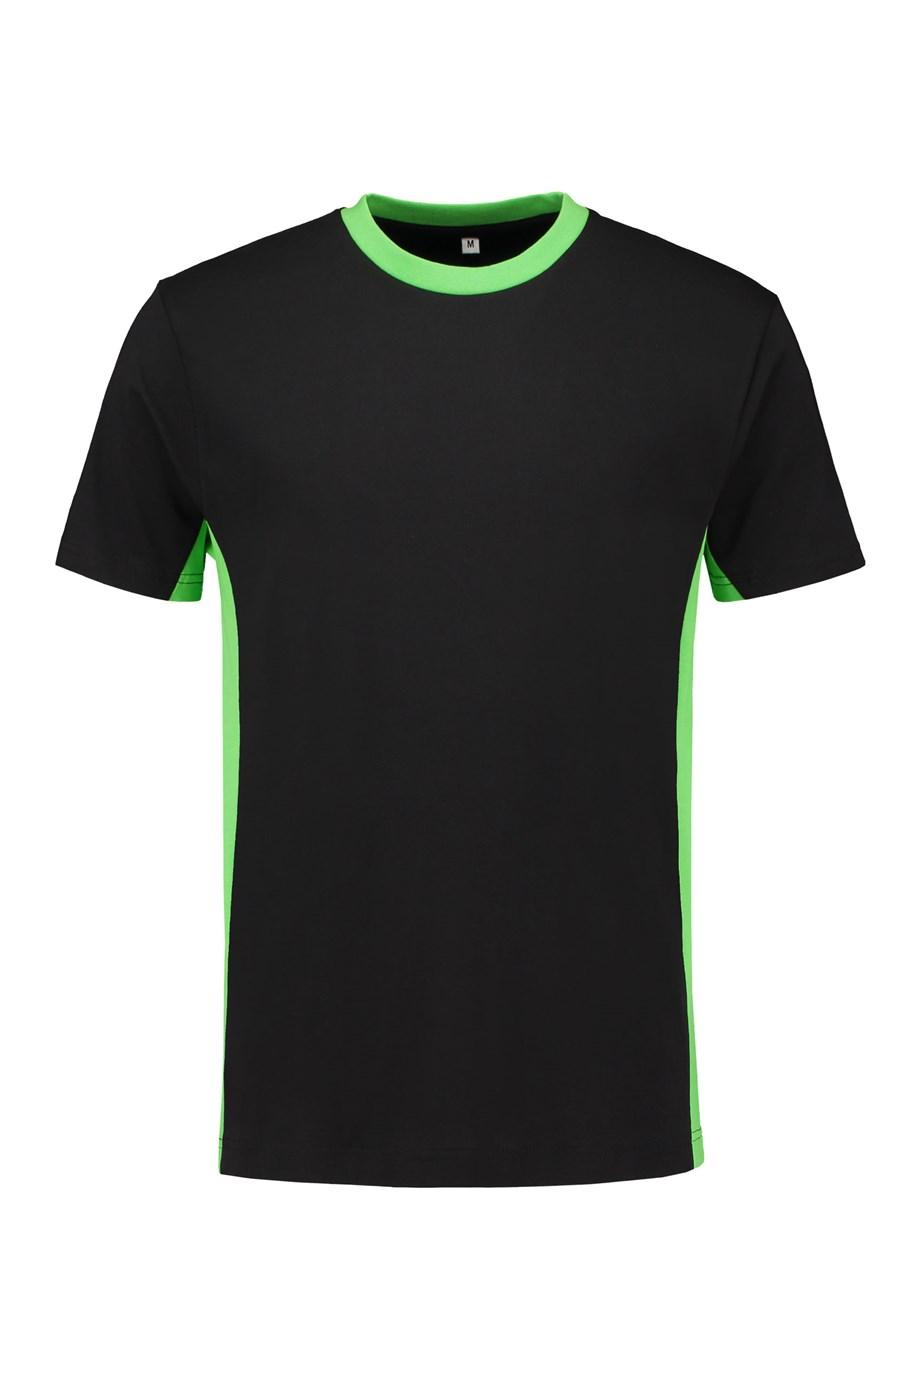 Black - Lime